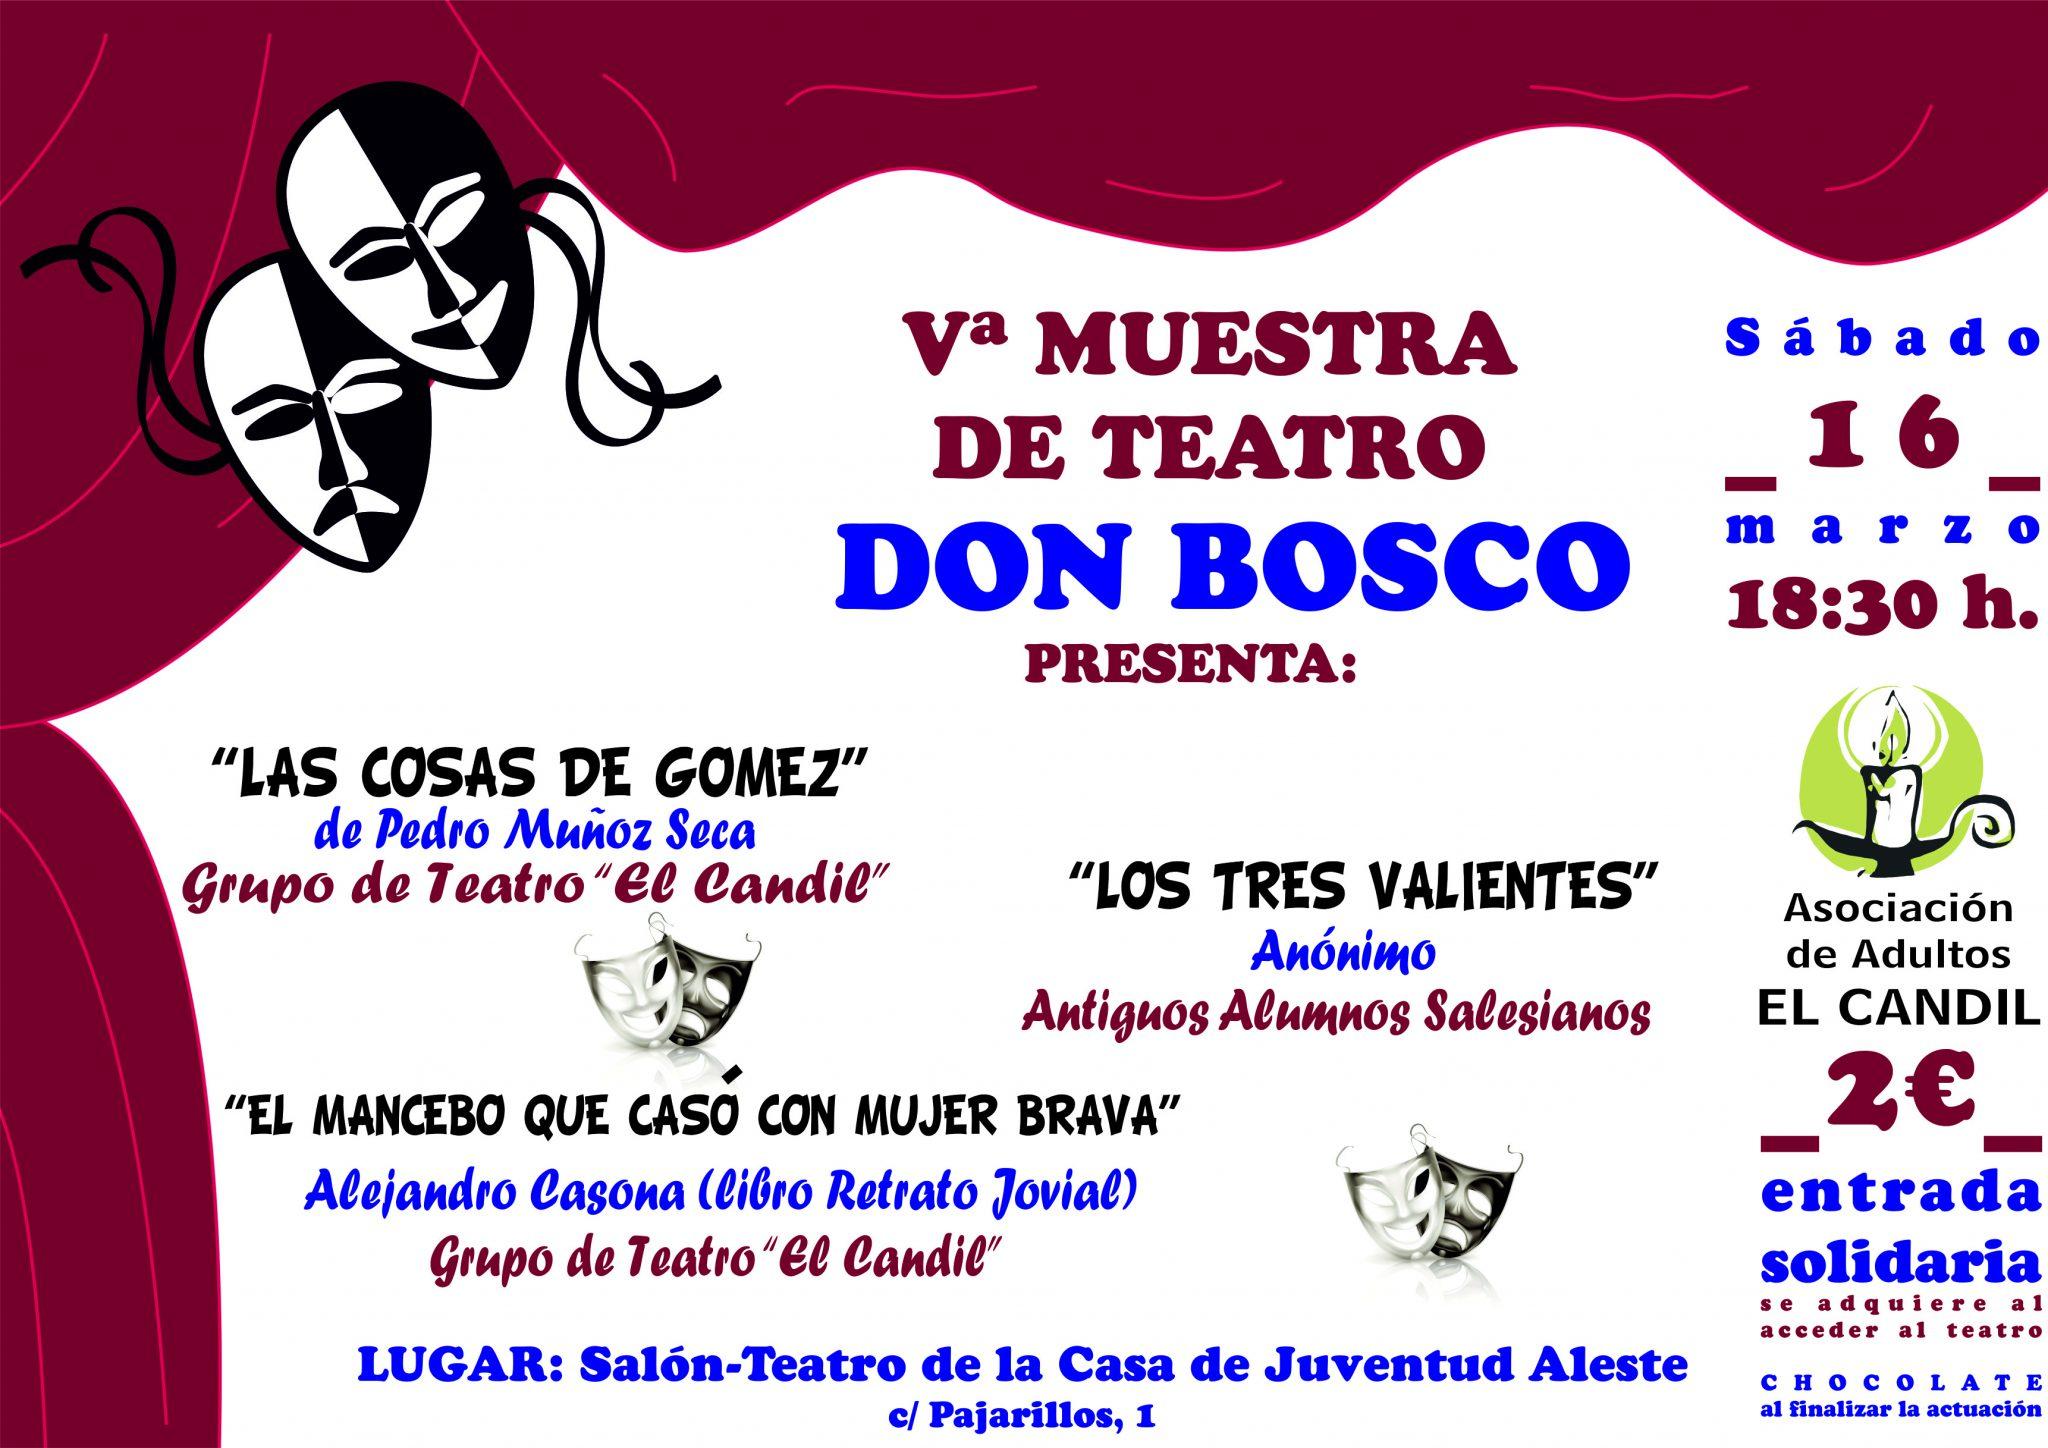 Vª MUESTRA DE TEATRO DON BOSCO